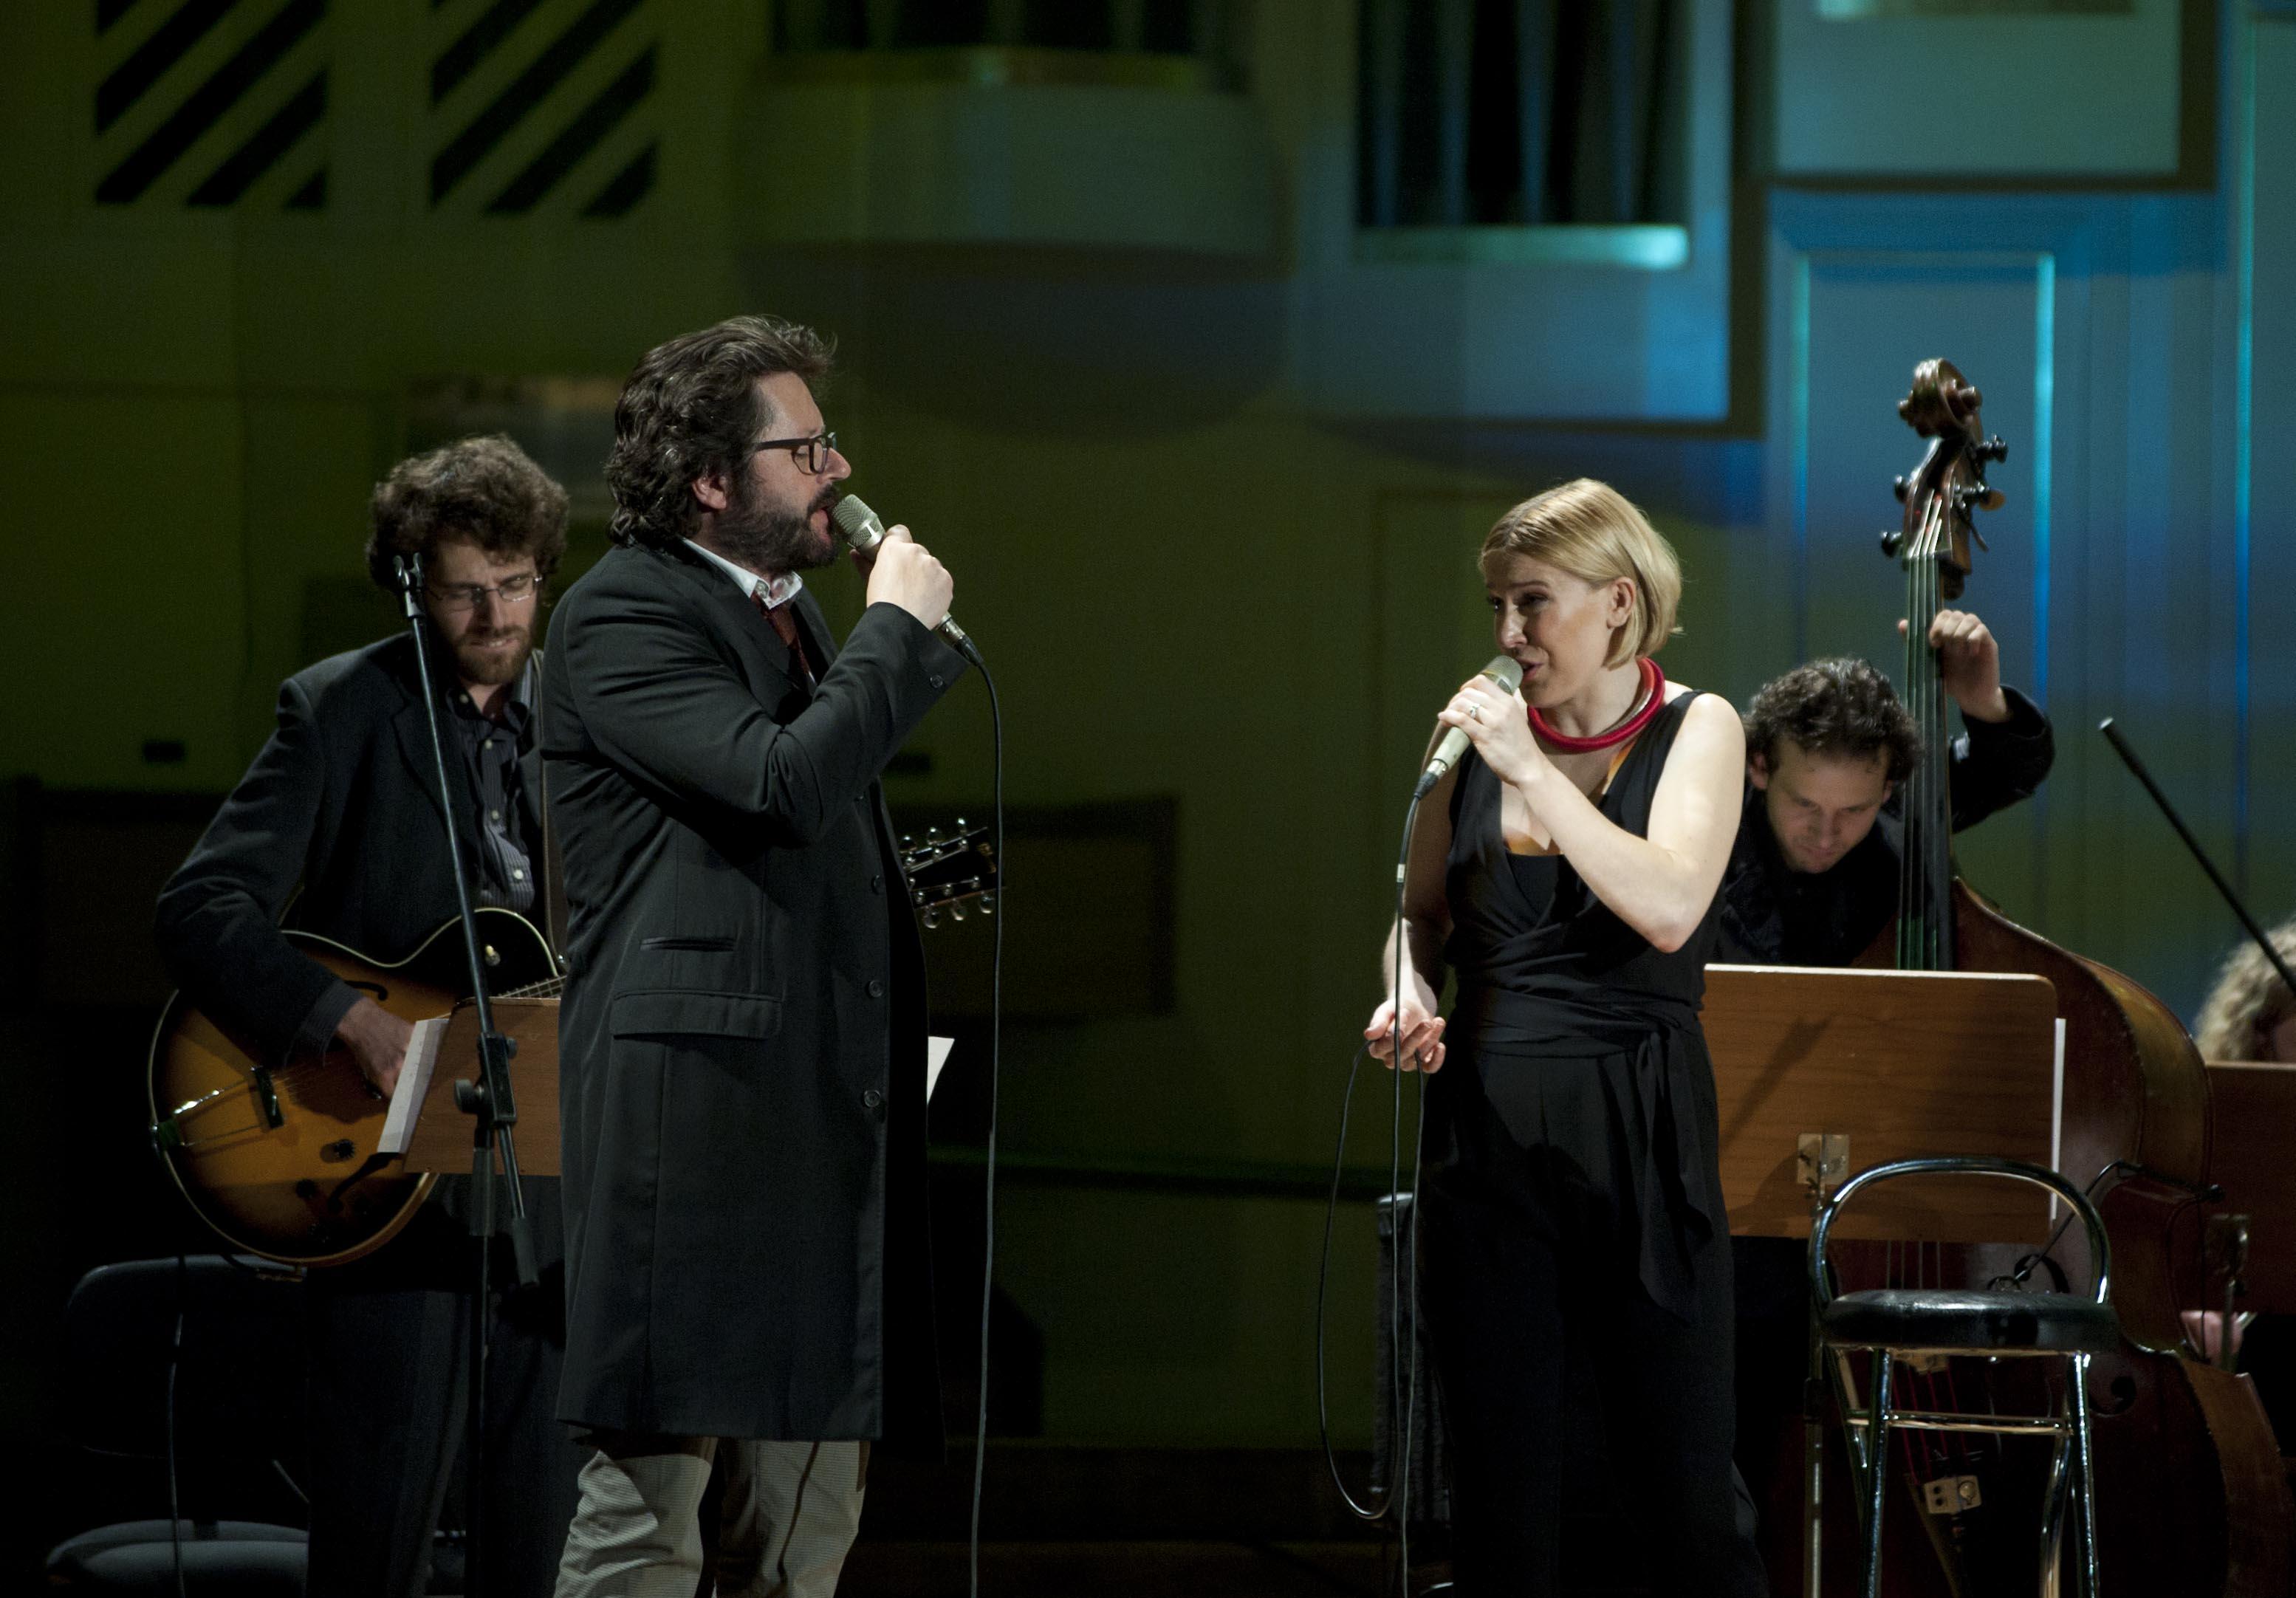 Aga Zaryan, koncert, fot. Paweł Ulatowski